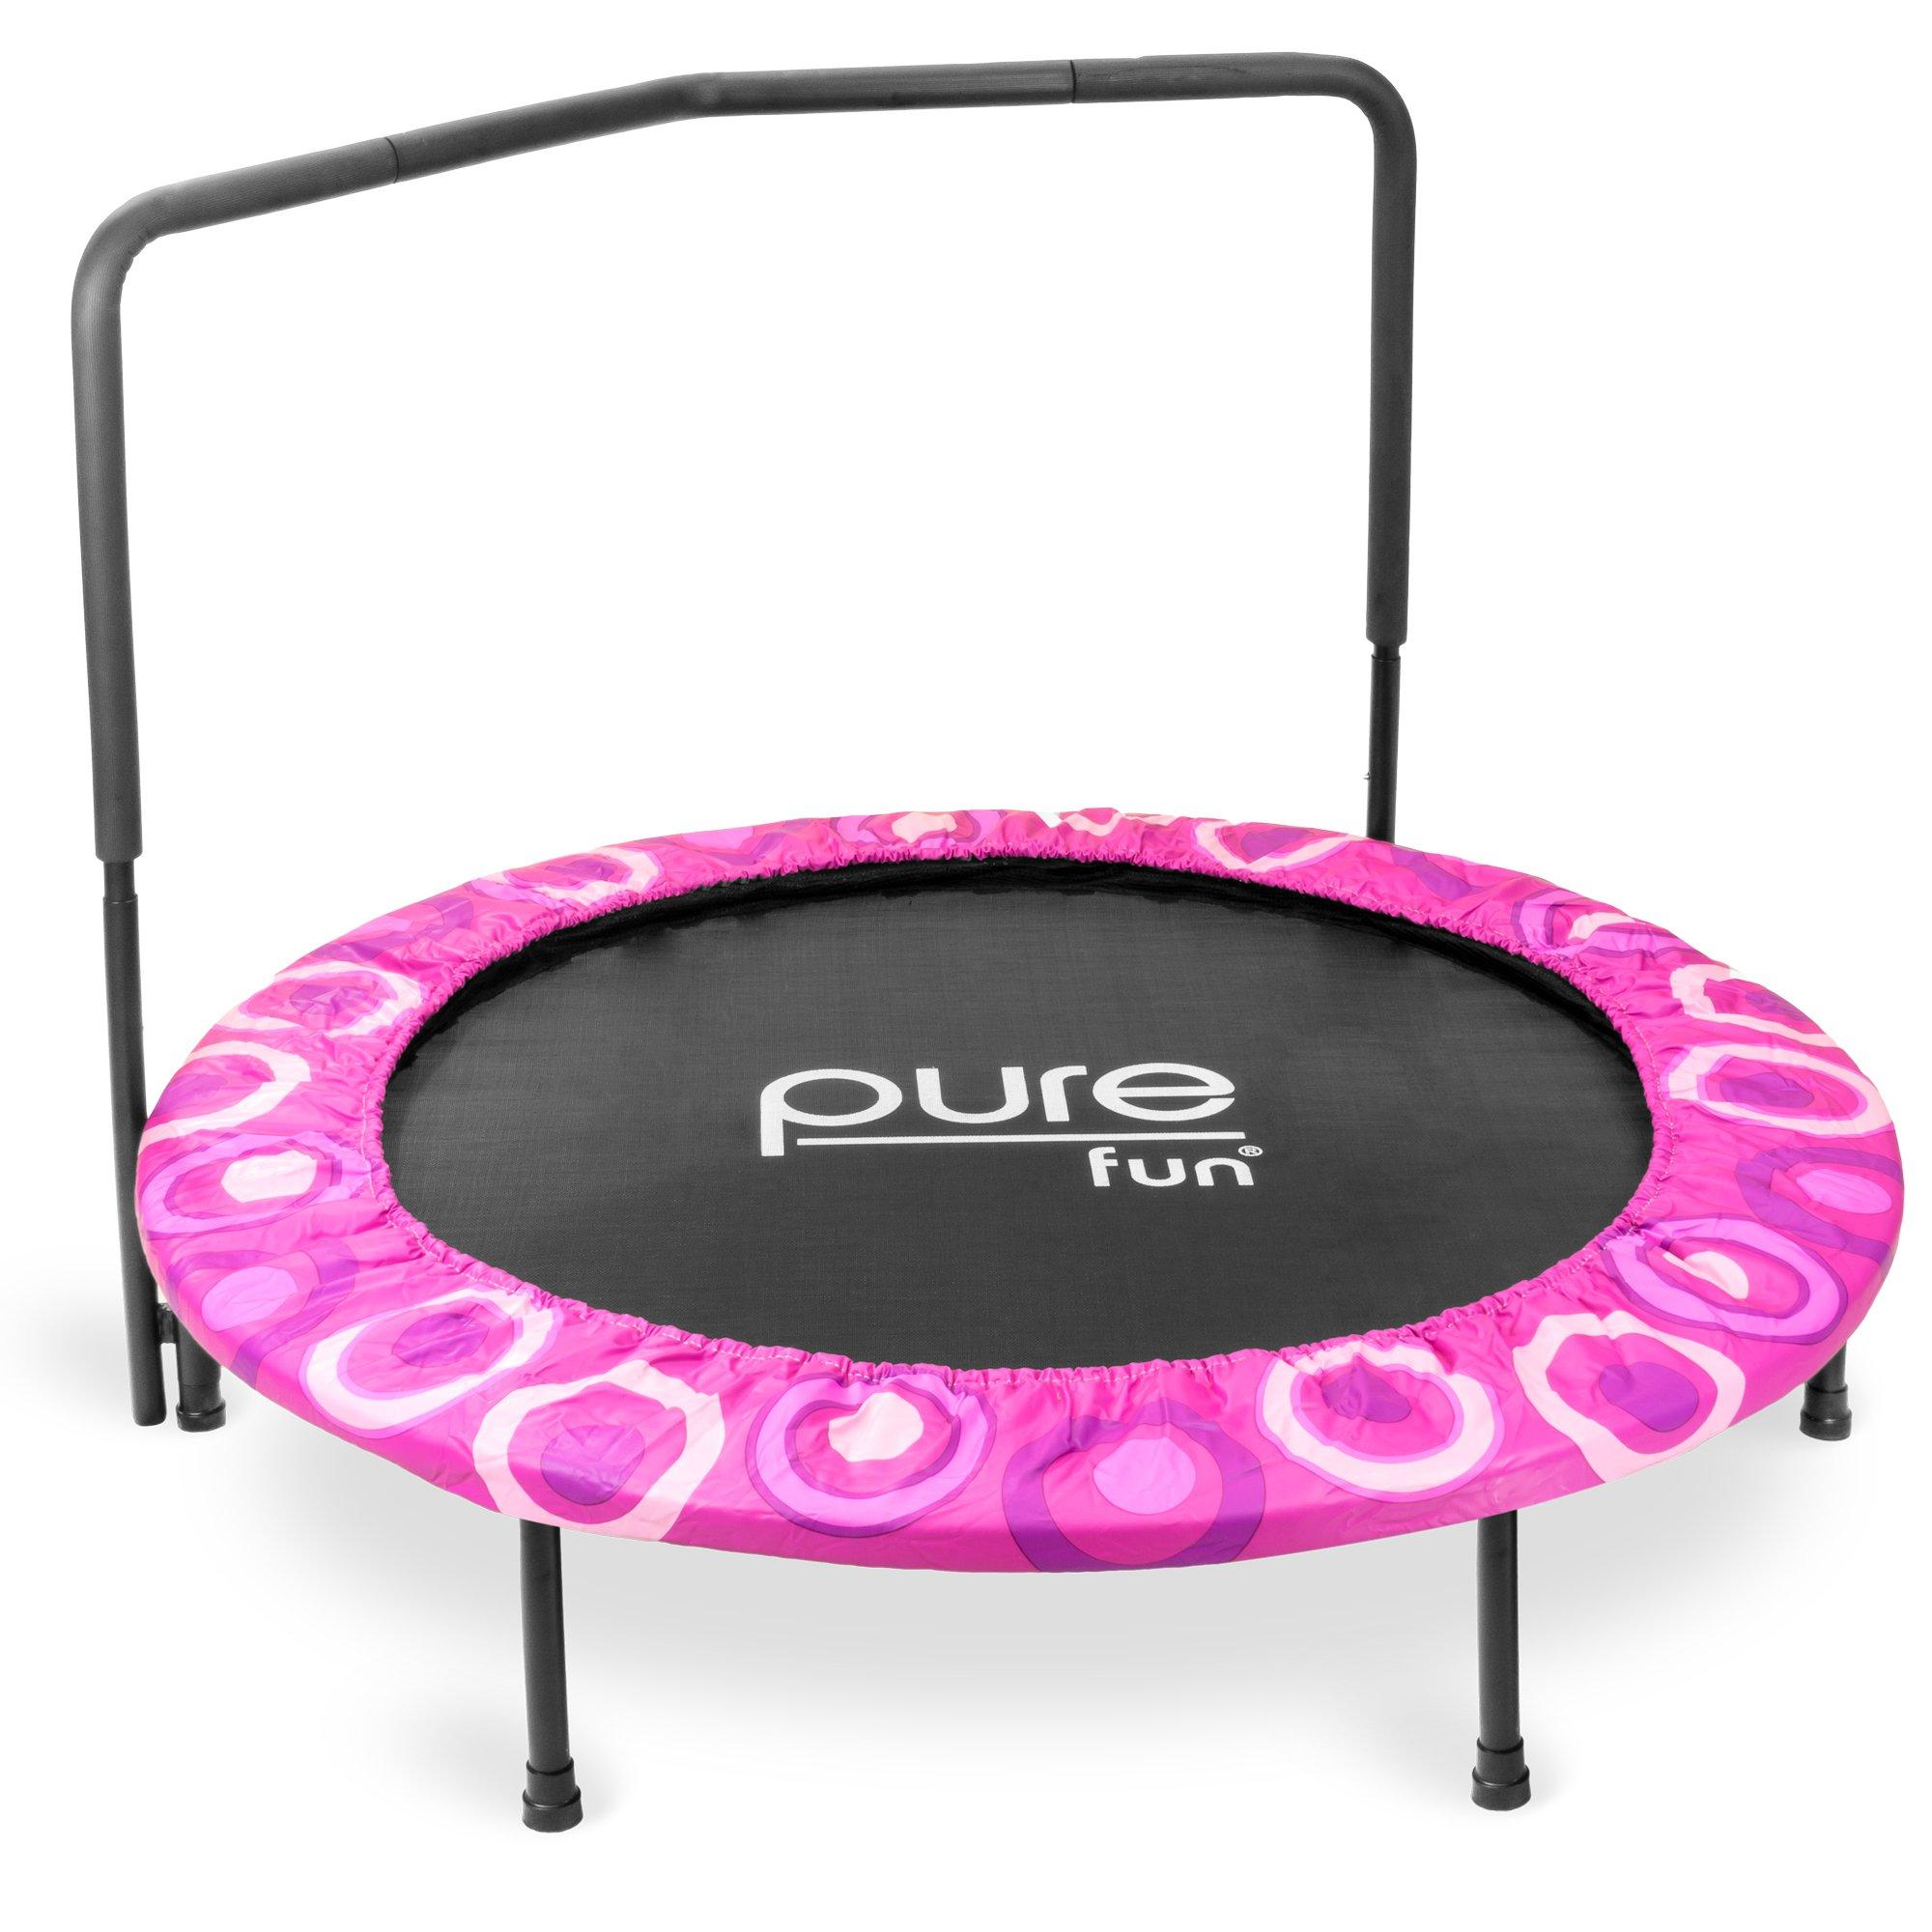 Pure Fun 9008SJ Super Jumper Kids Trampoline with Handrail, Pink - 48 Inches by Pure Fun